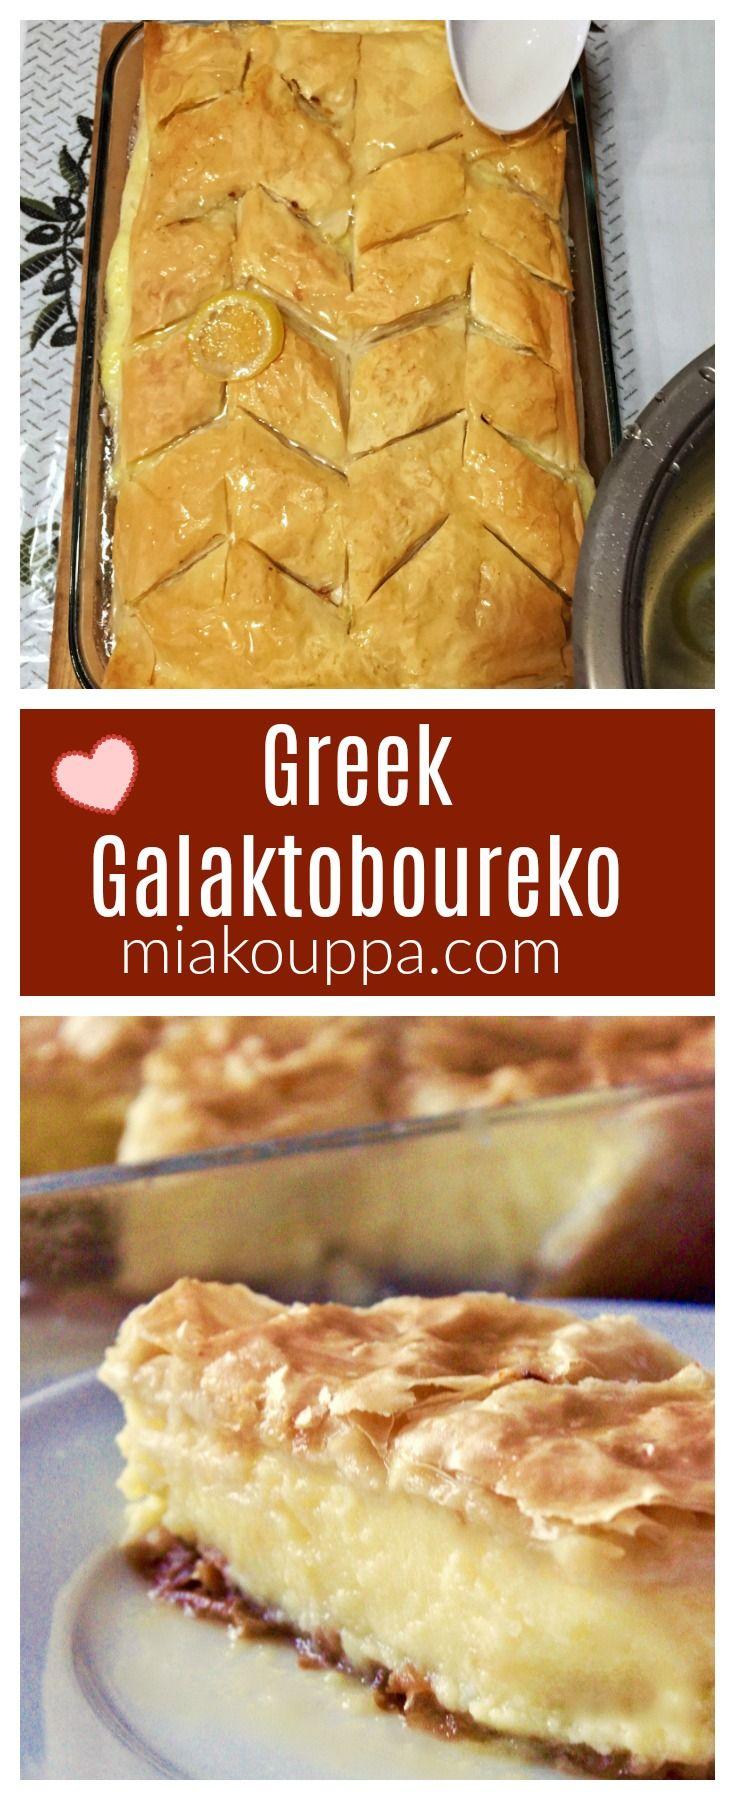 Galaktoboureko a delicious greek phyllo encased a delicious greek phyllo encased custard filled syrup soaked dessert that is surprisingly quite easy to make pinterest forumfinder Gallery